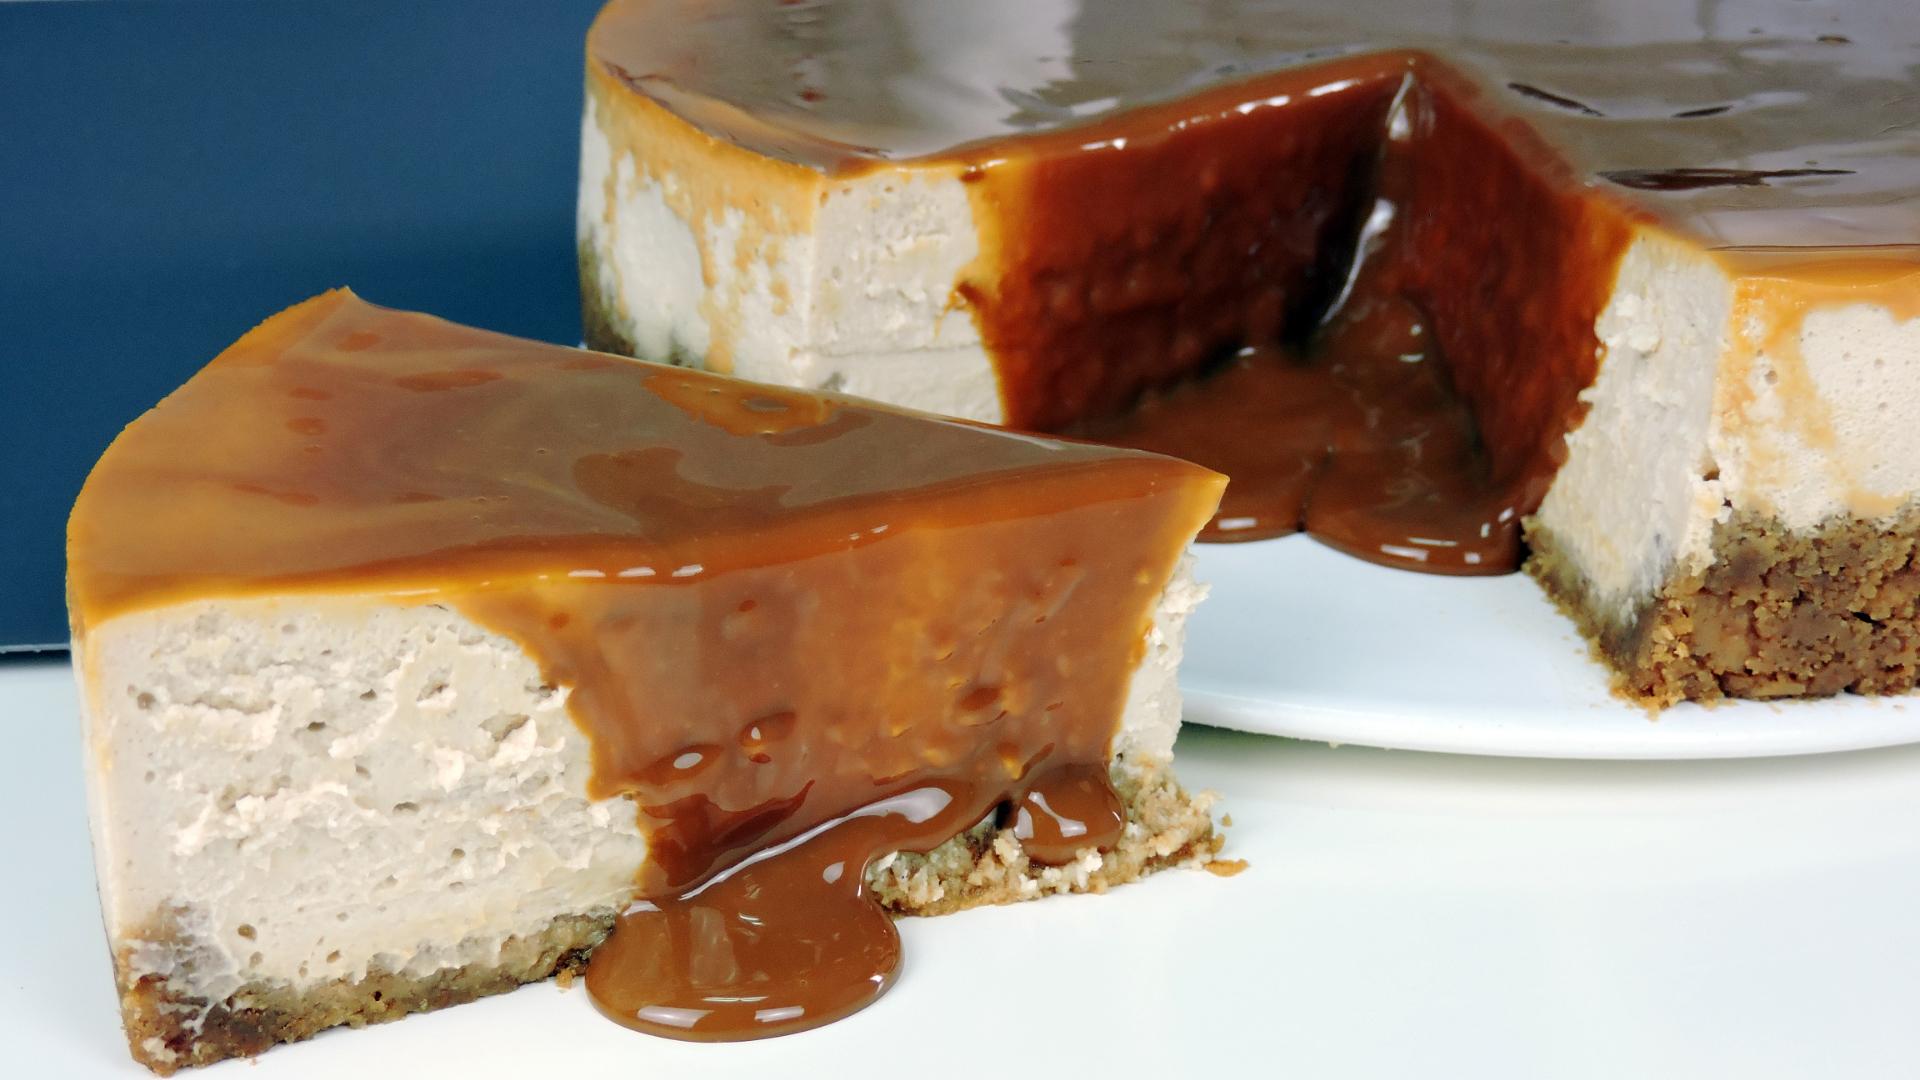 TARTA DE QUESO con DULCE DE LECHE (milk caramel cheesecake)